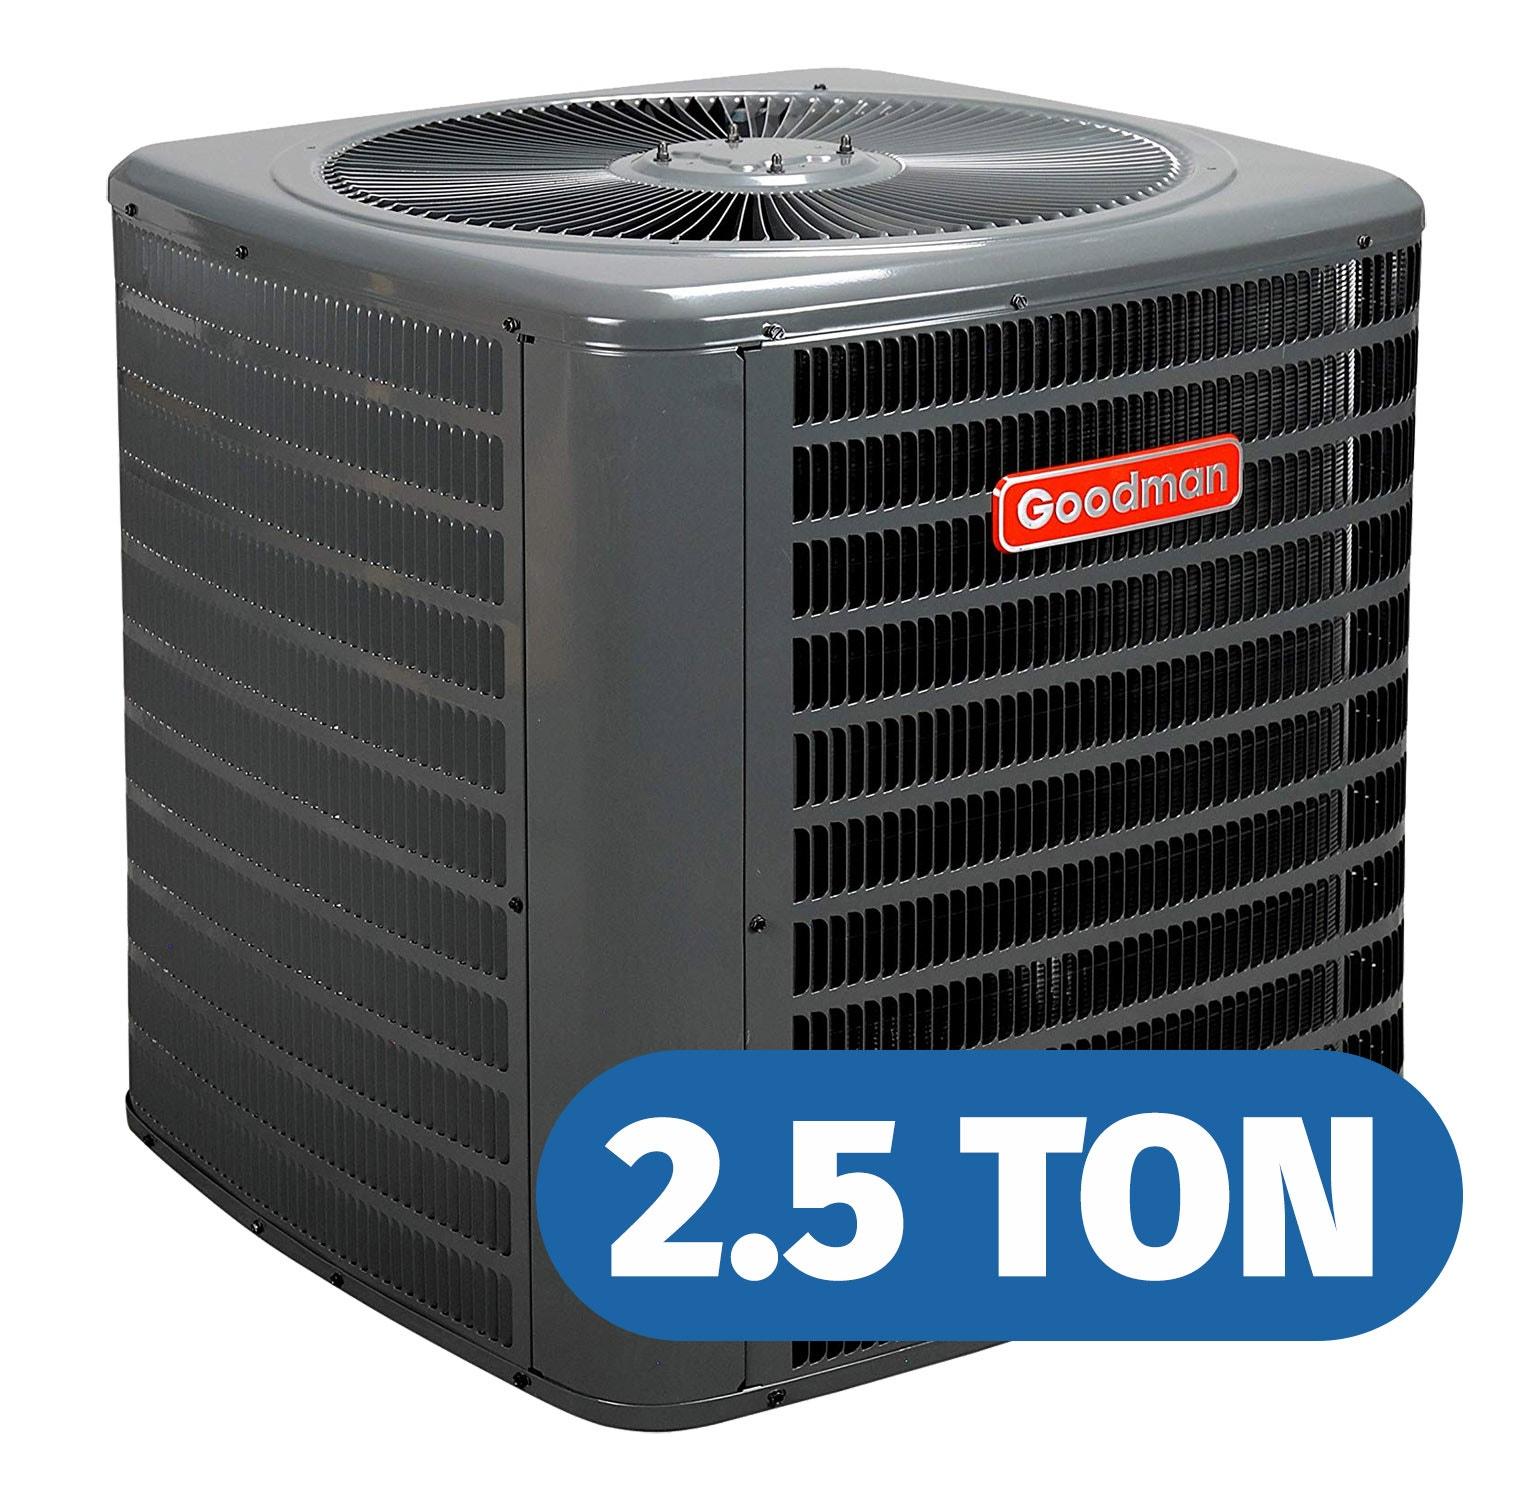 Goodman 2.5 Ton Heat Pumps